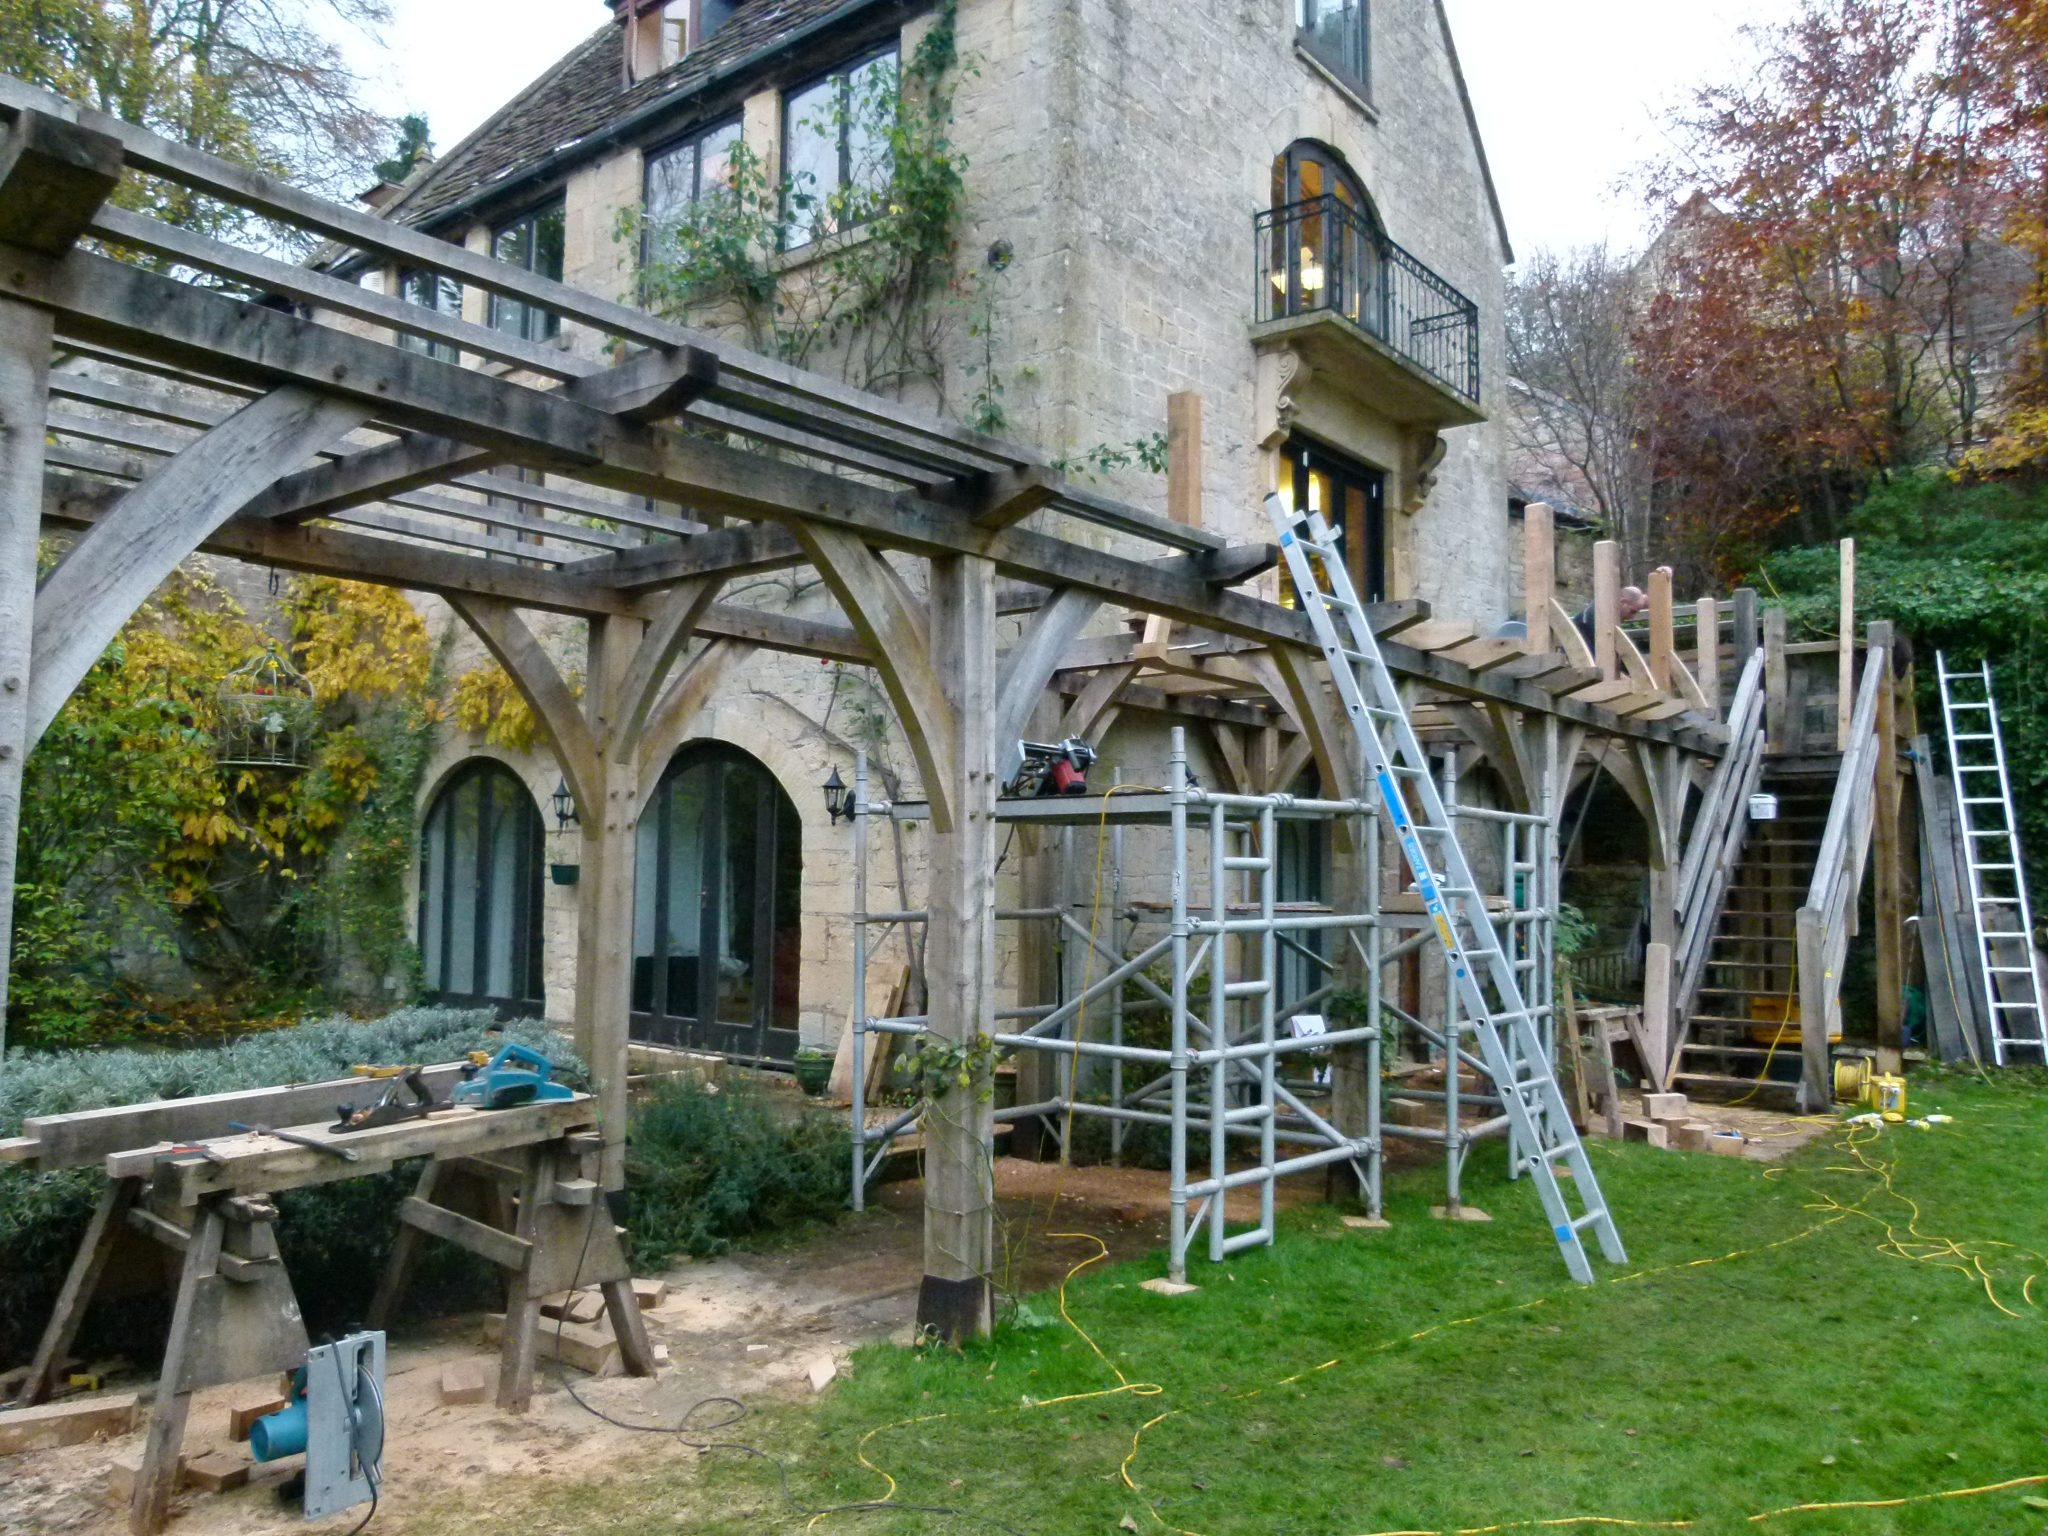 oak pergola and balcony - Turleigh - Wiltshire